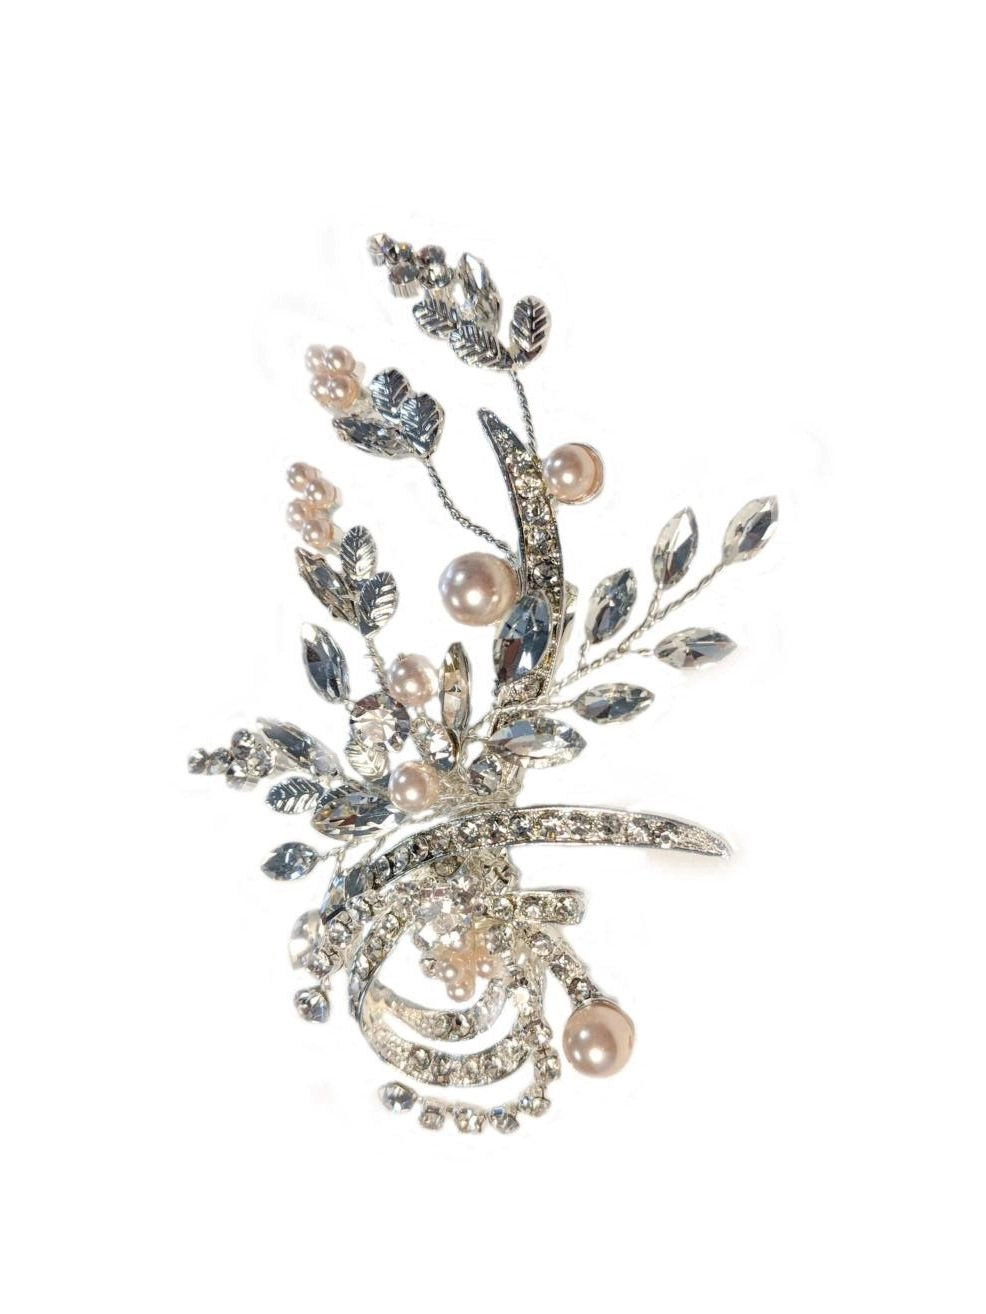 lp740 champagne pearl wedding hair accessory